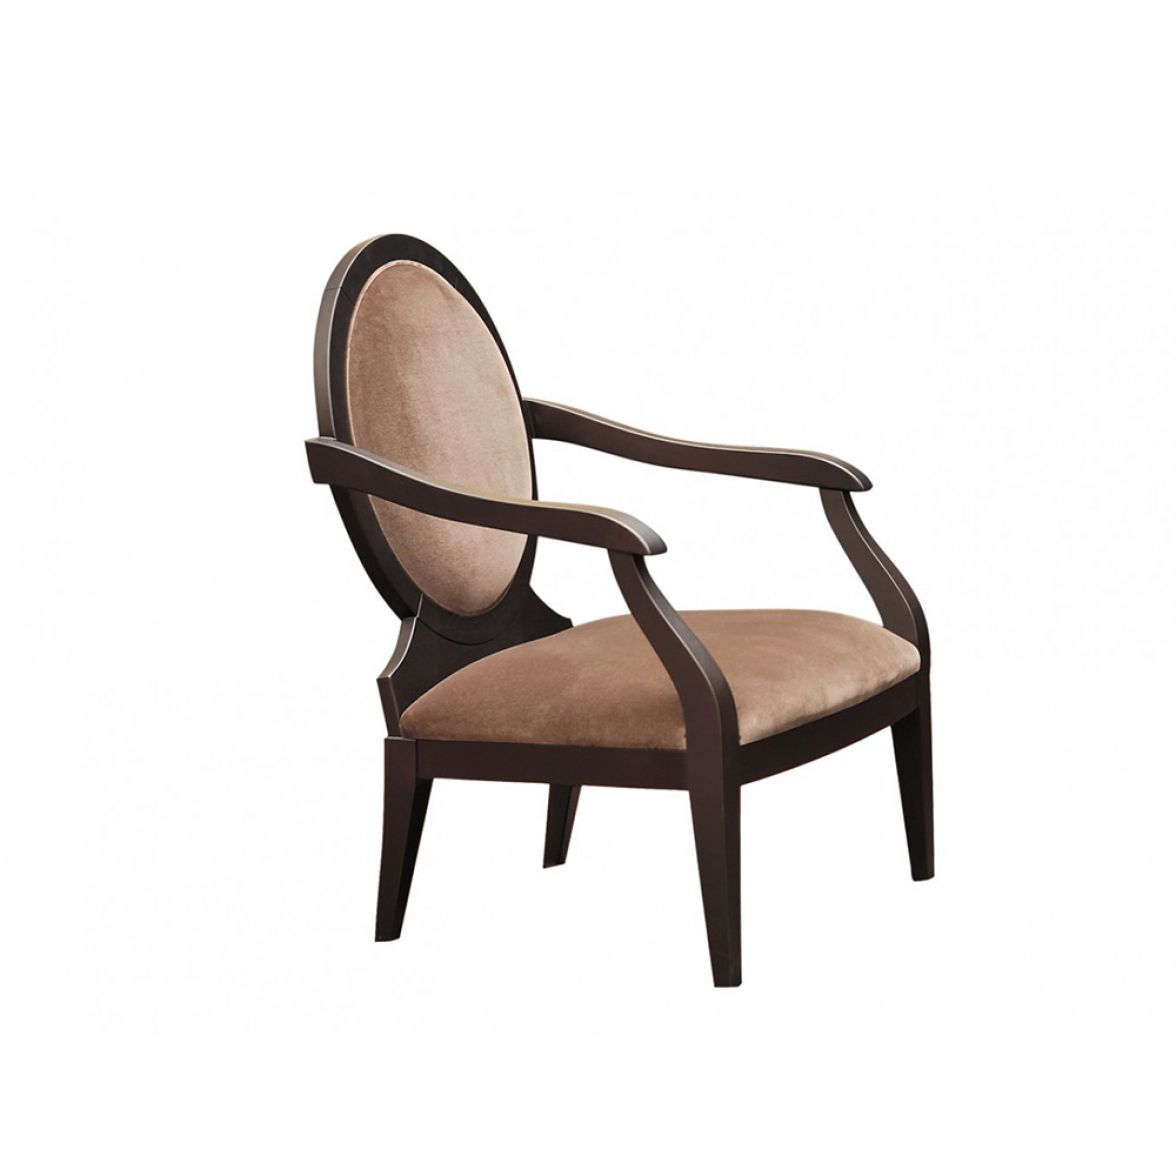 Donadue armchair фото цена